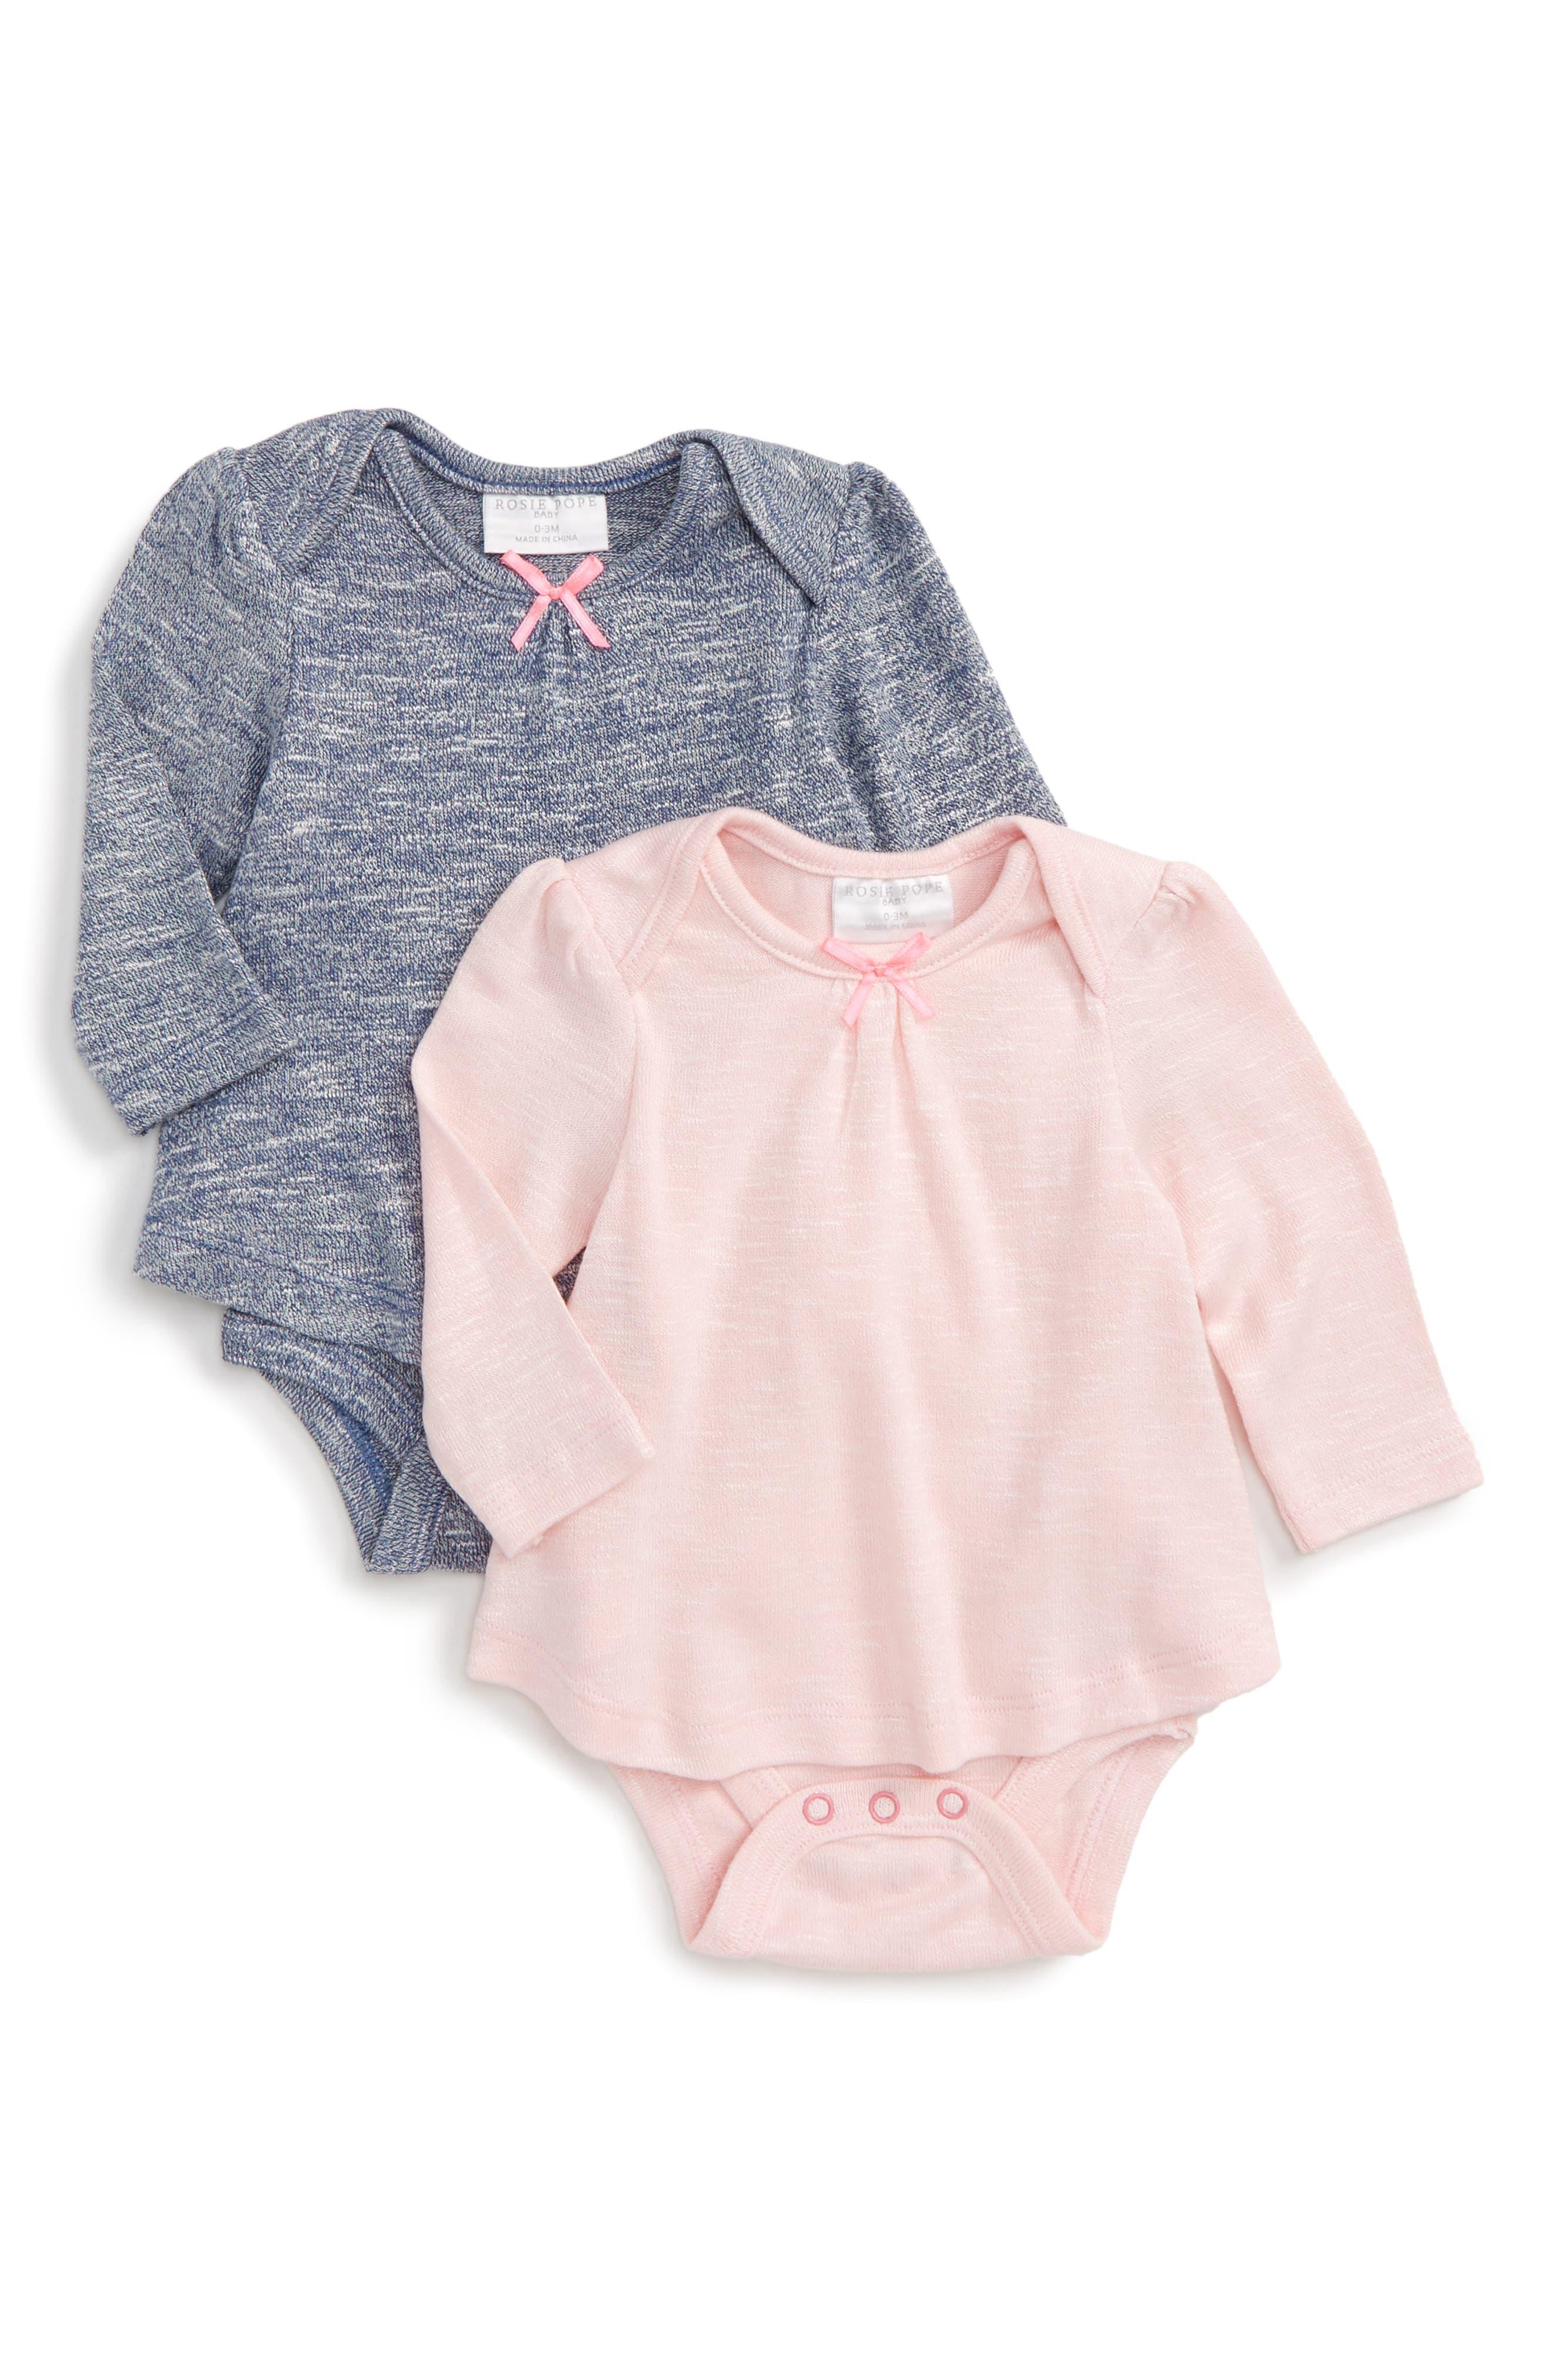 2-Pack Knit Bodysuits,                         Main,                         color, 461